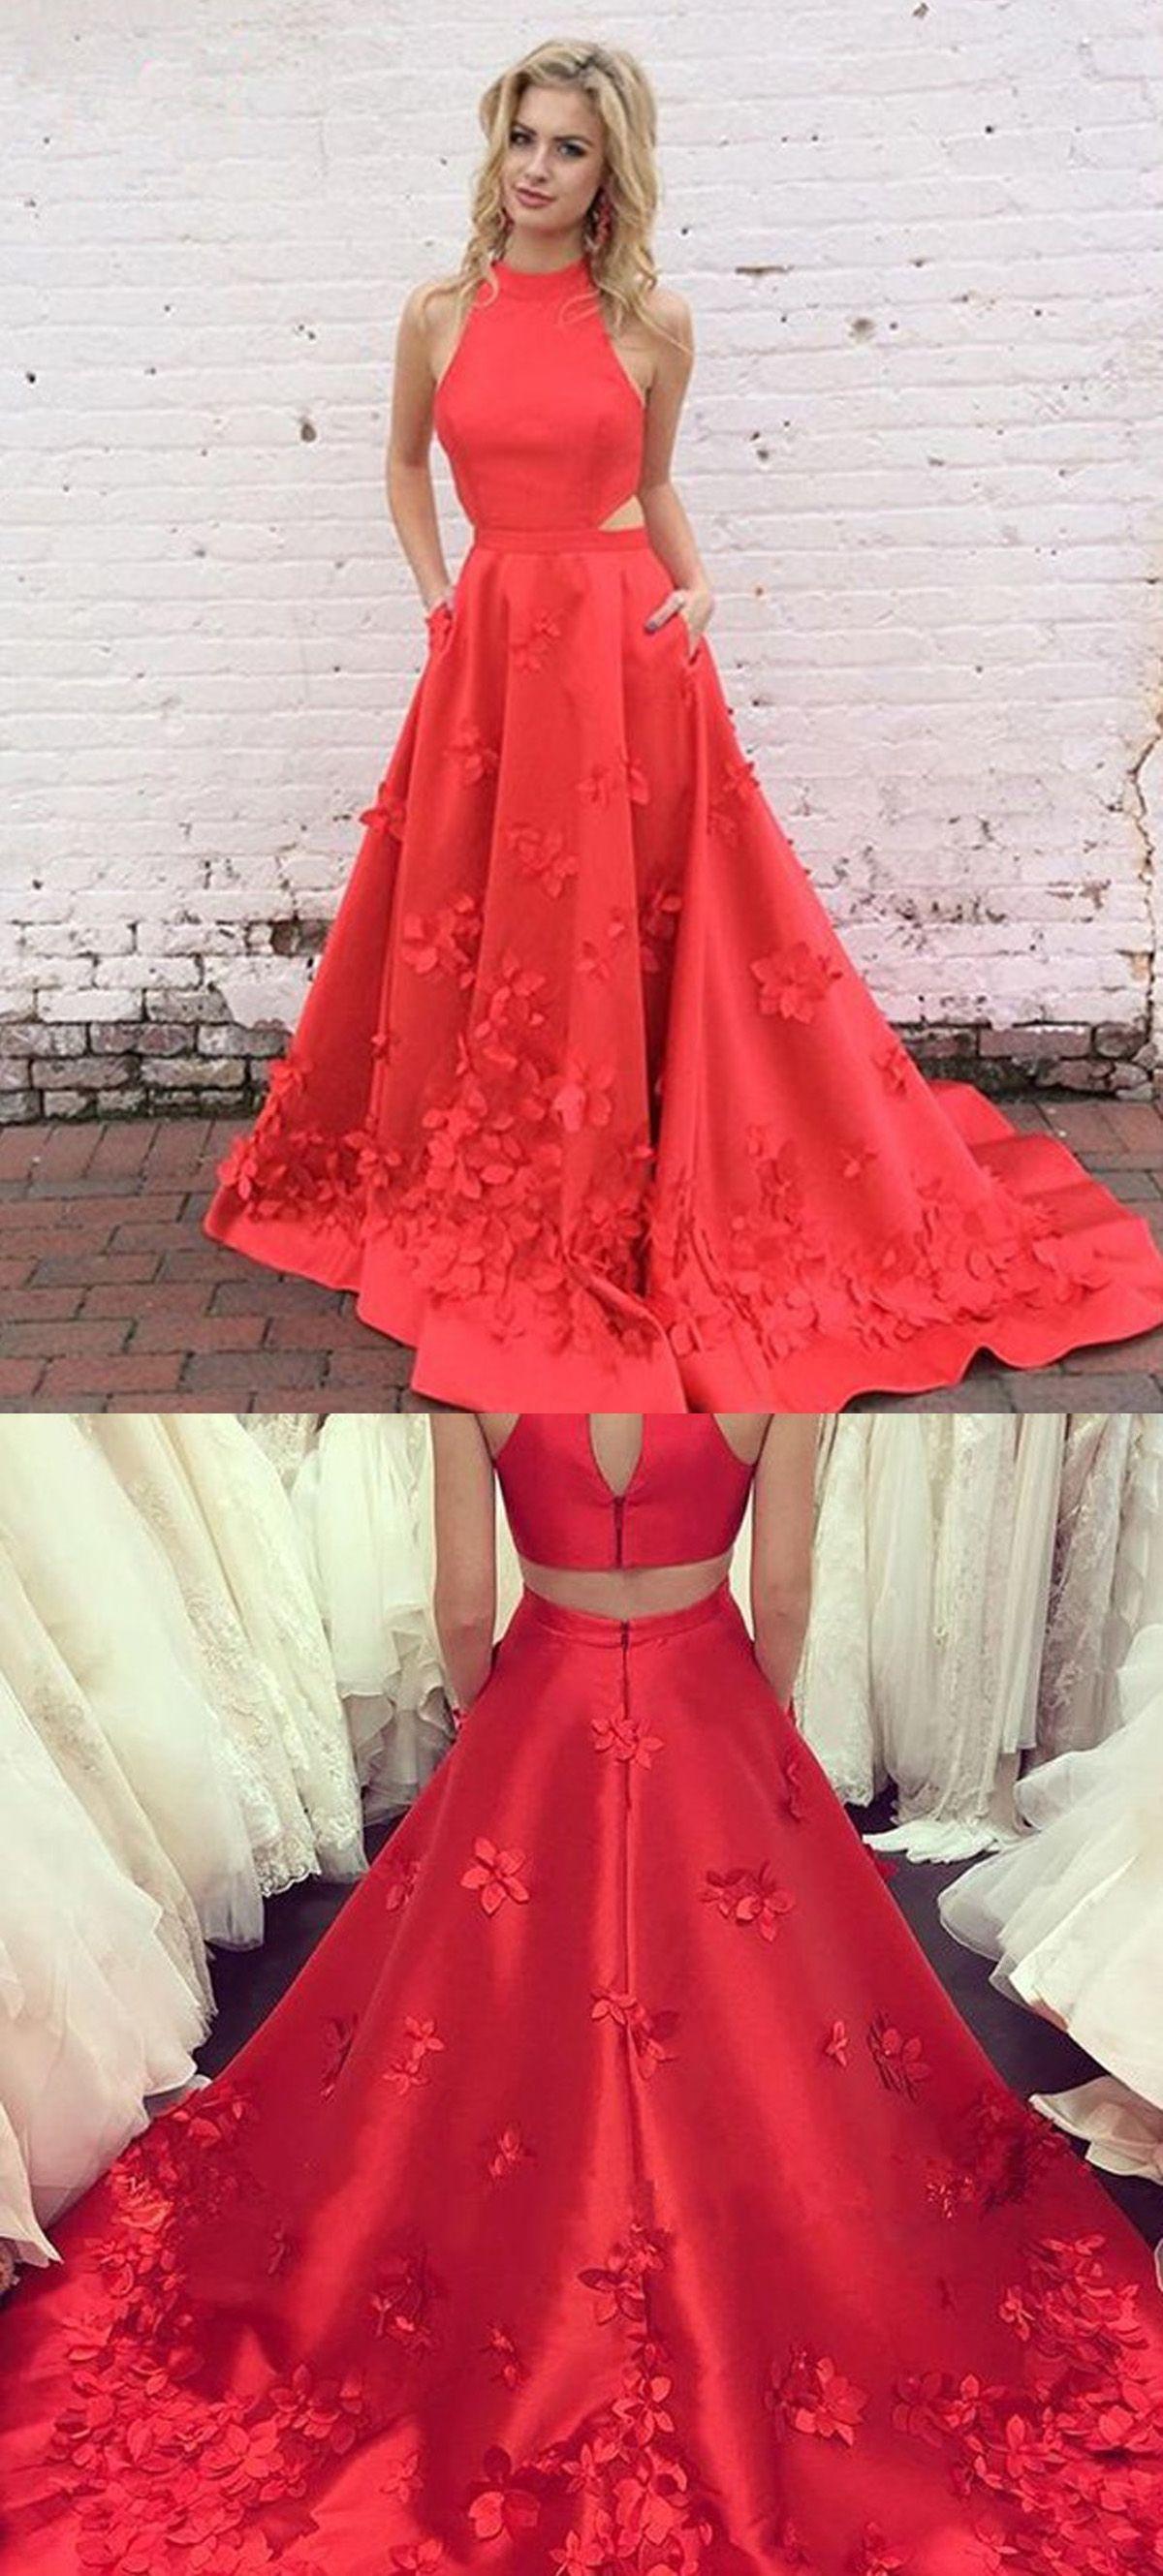 Aline prom dresseshigh neck prom dresseskeyhole back prom dresses